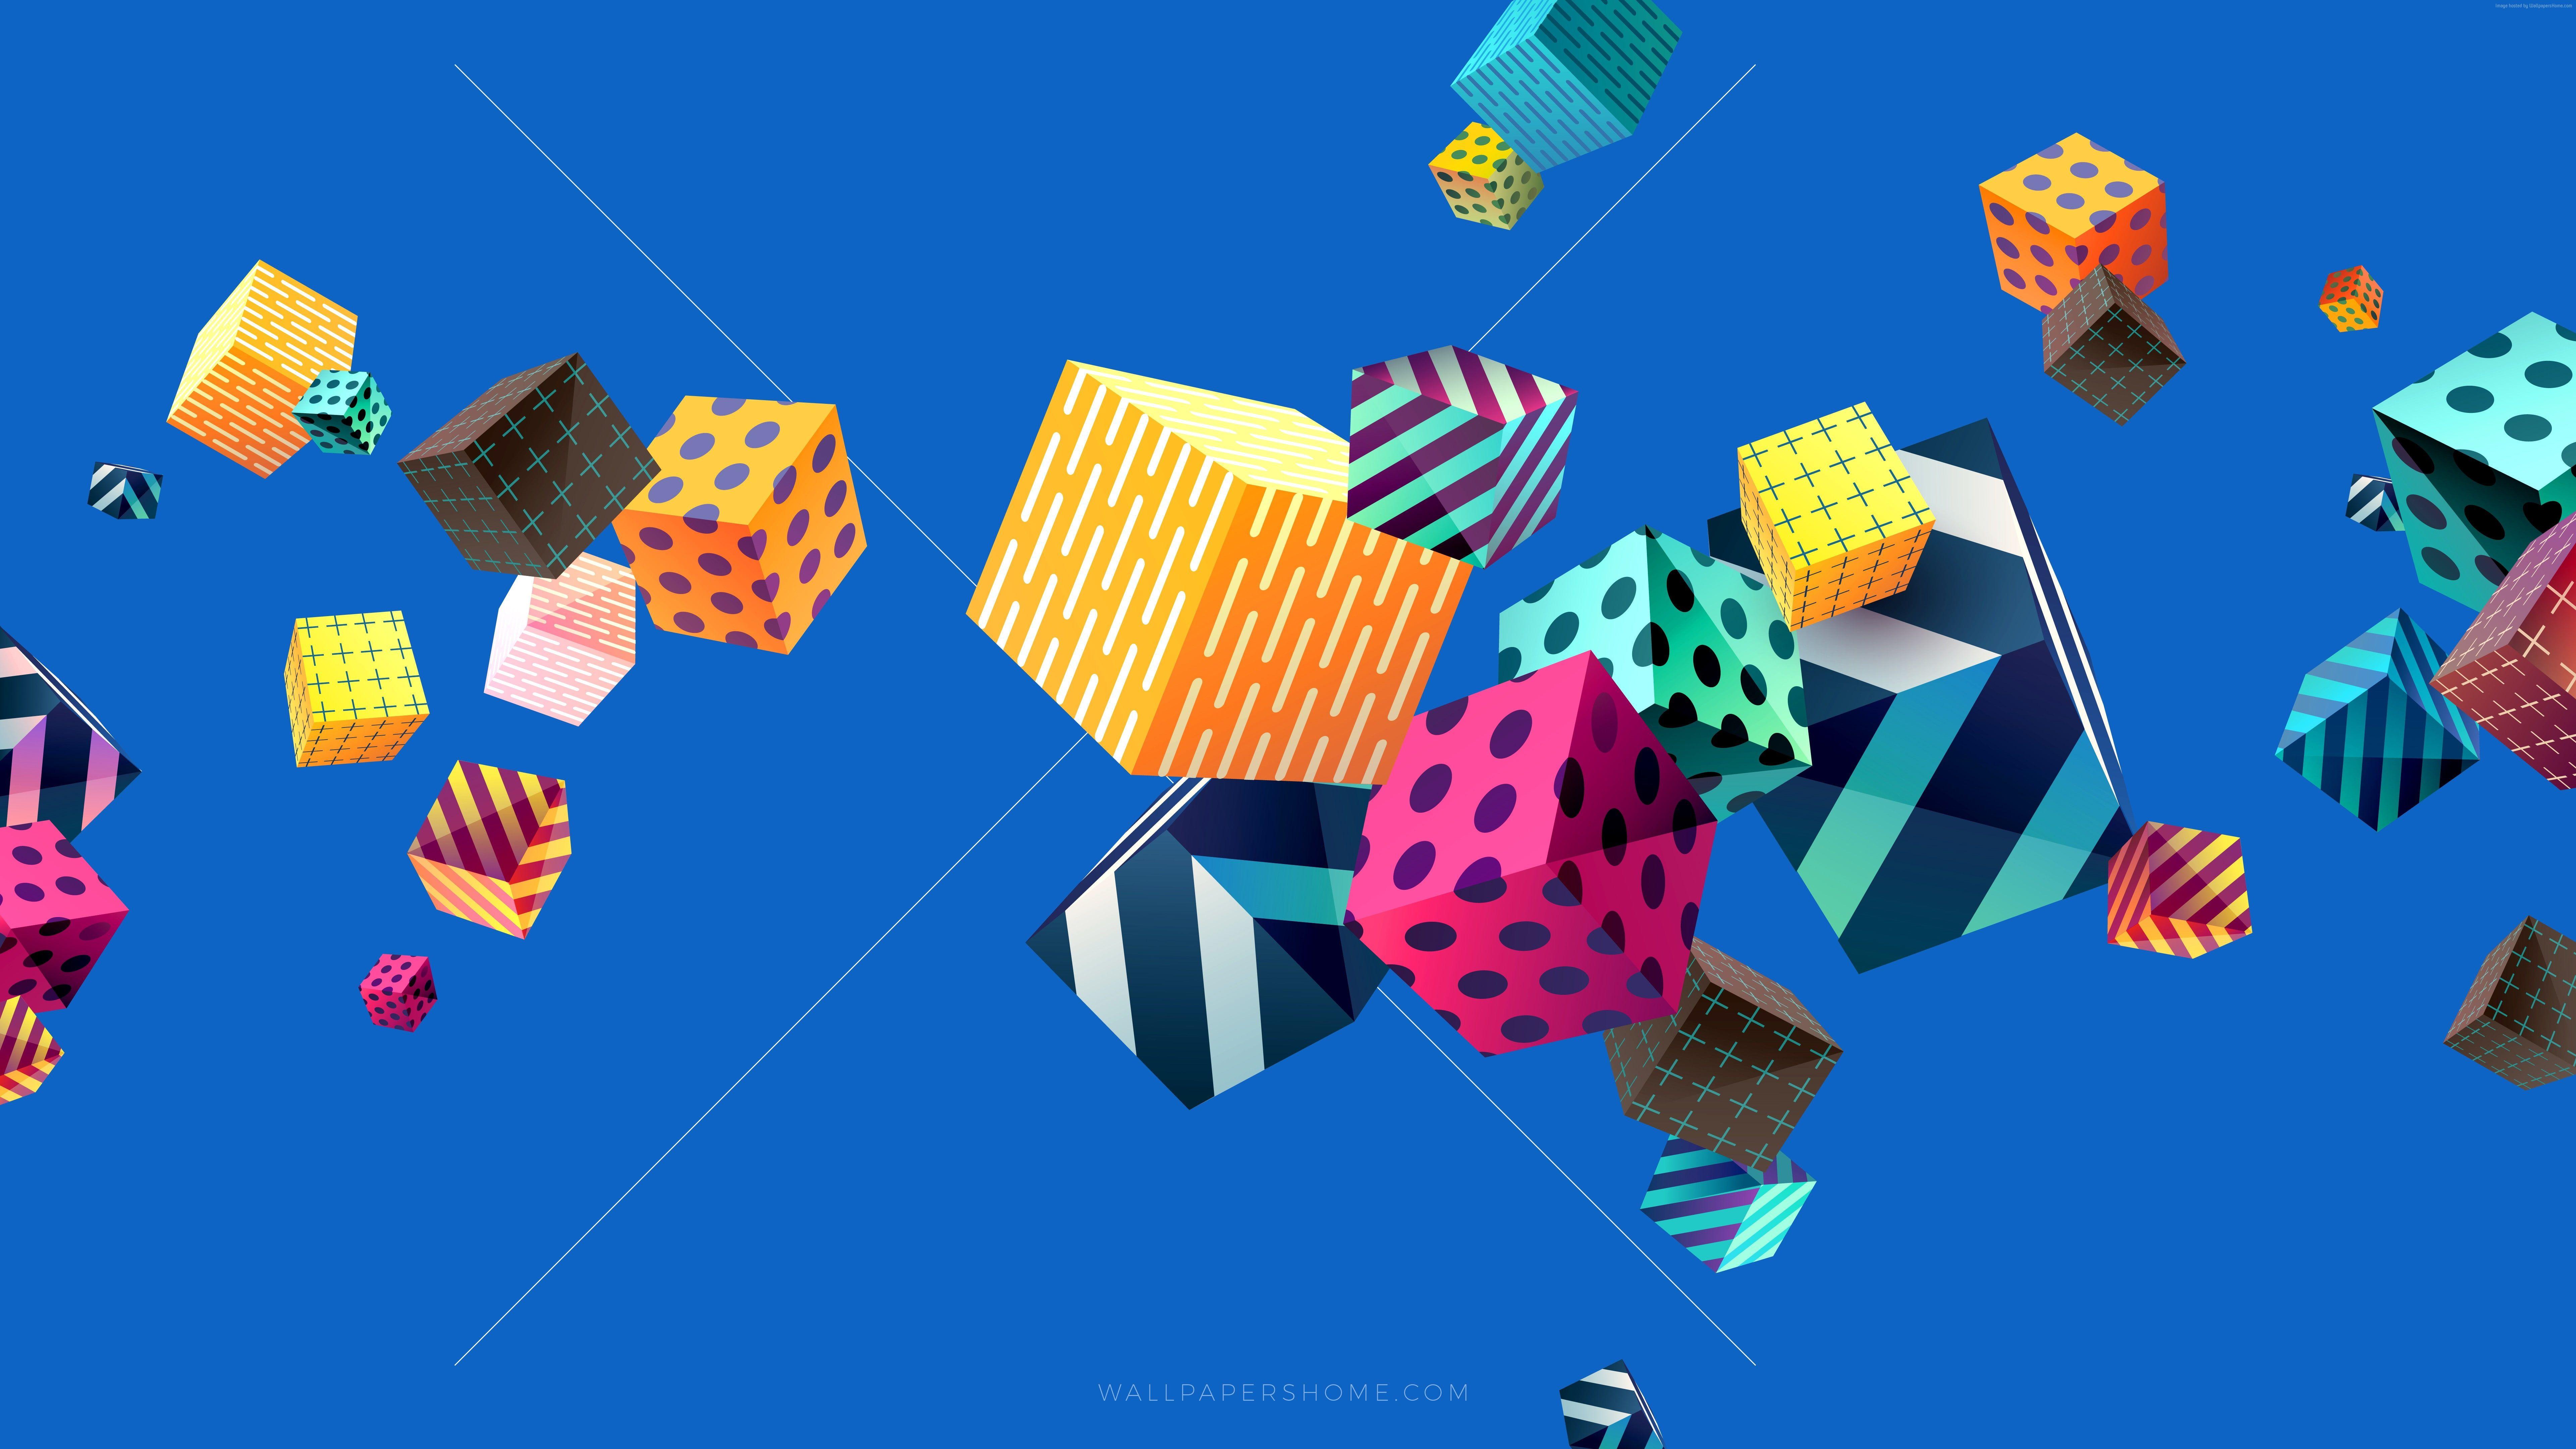 4k Modern 5k Colorful Cubes Abstract 8k 8k Wallpaper Hdwallpaper Desktop Abstract 8k Wallpaper Abstract Wallpaper